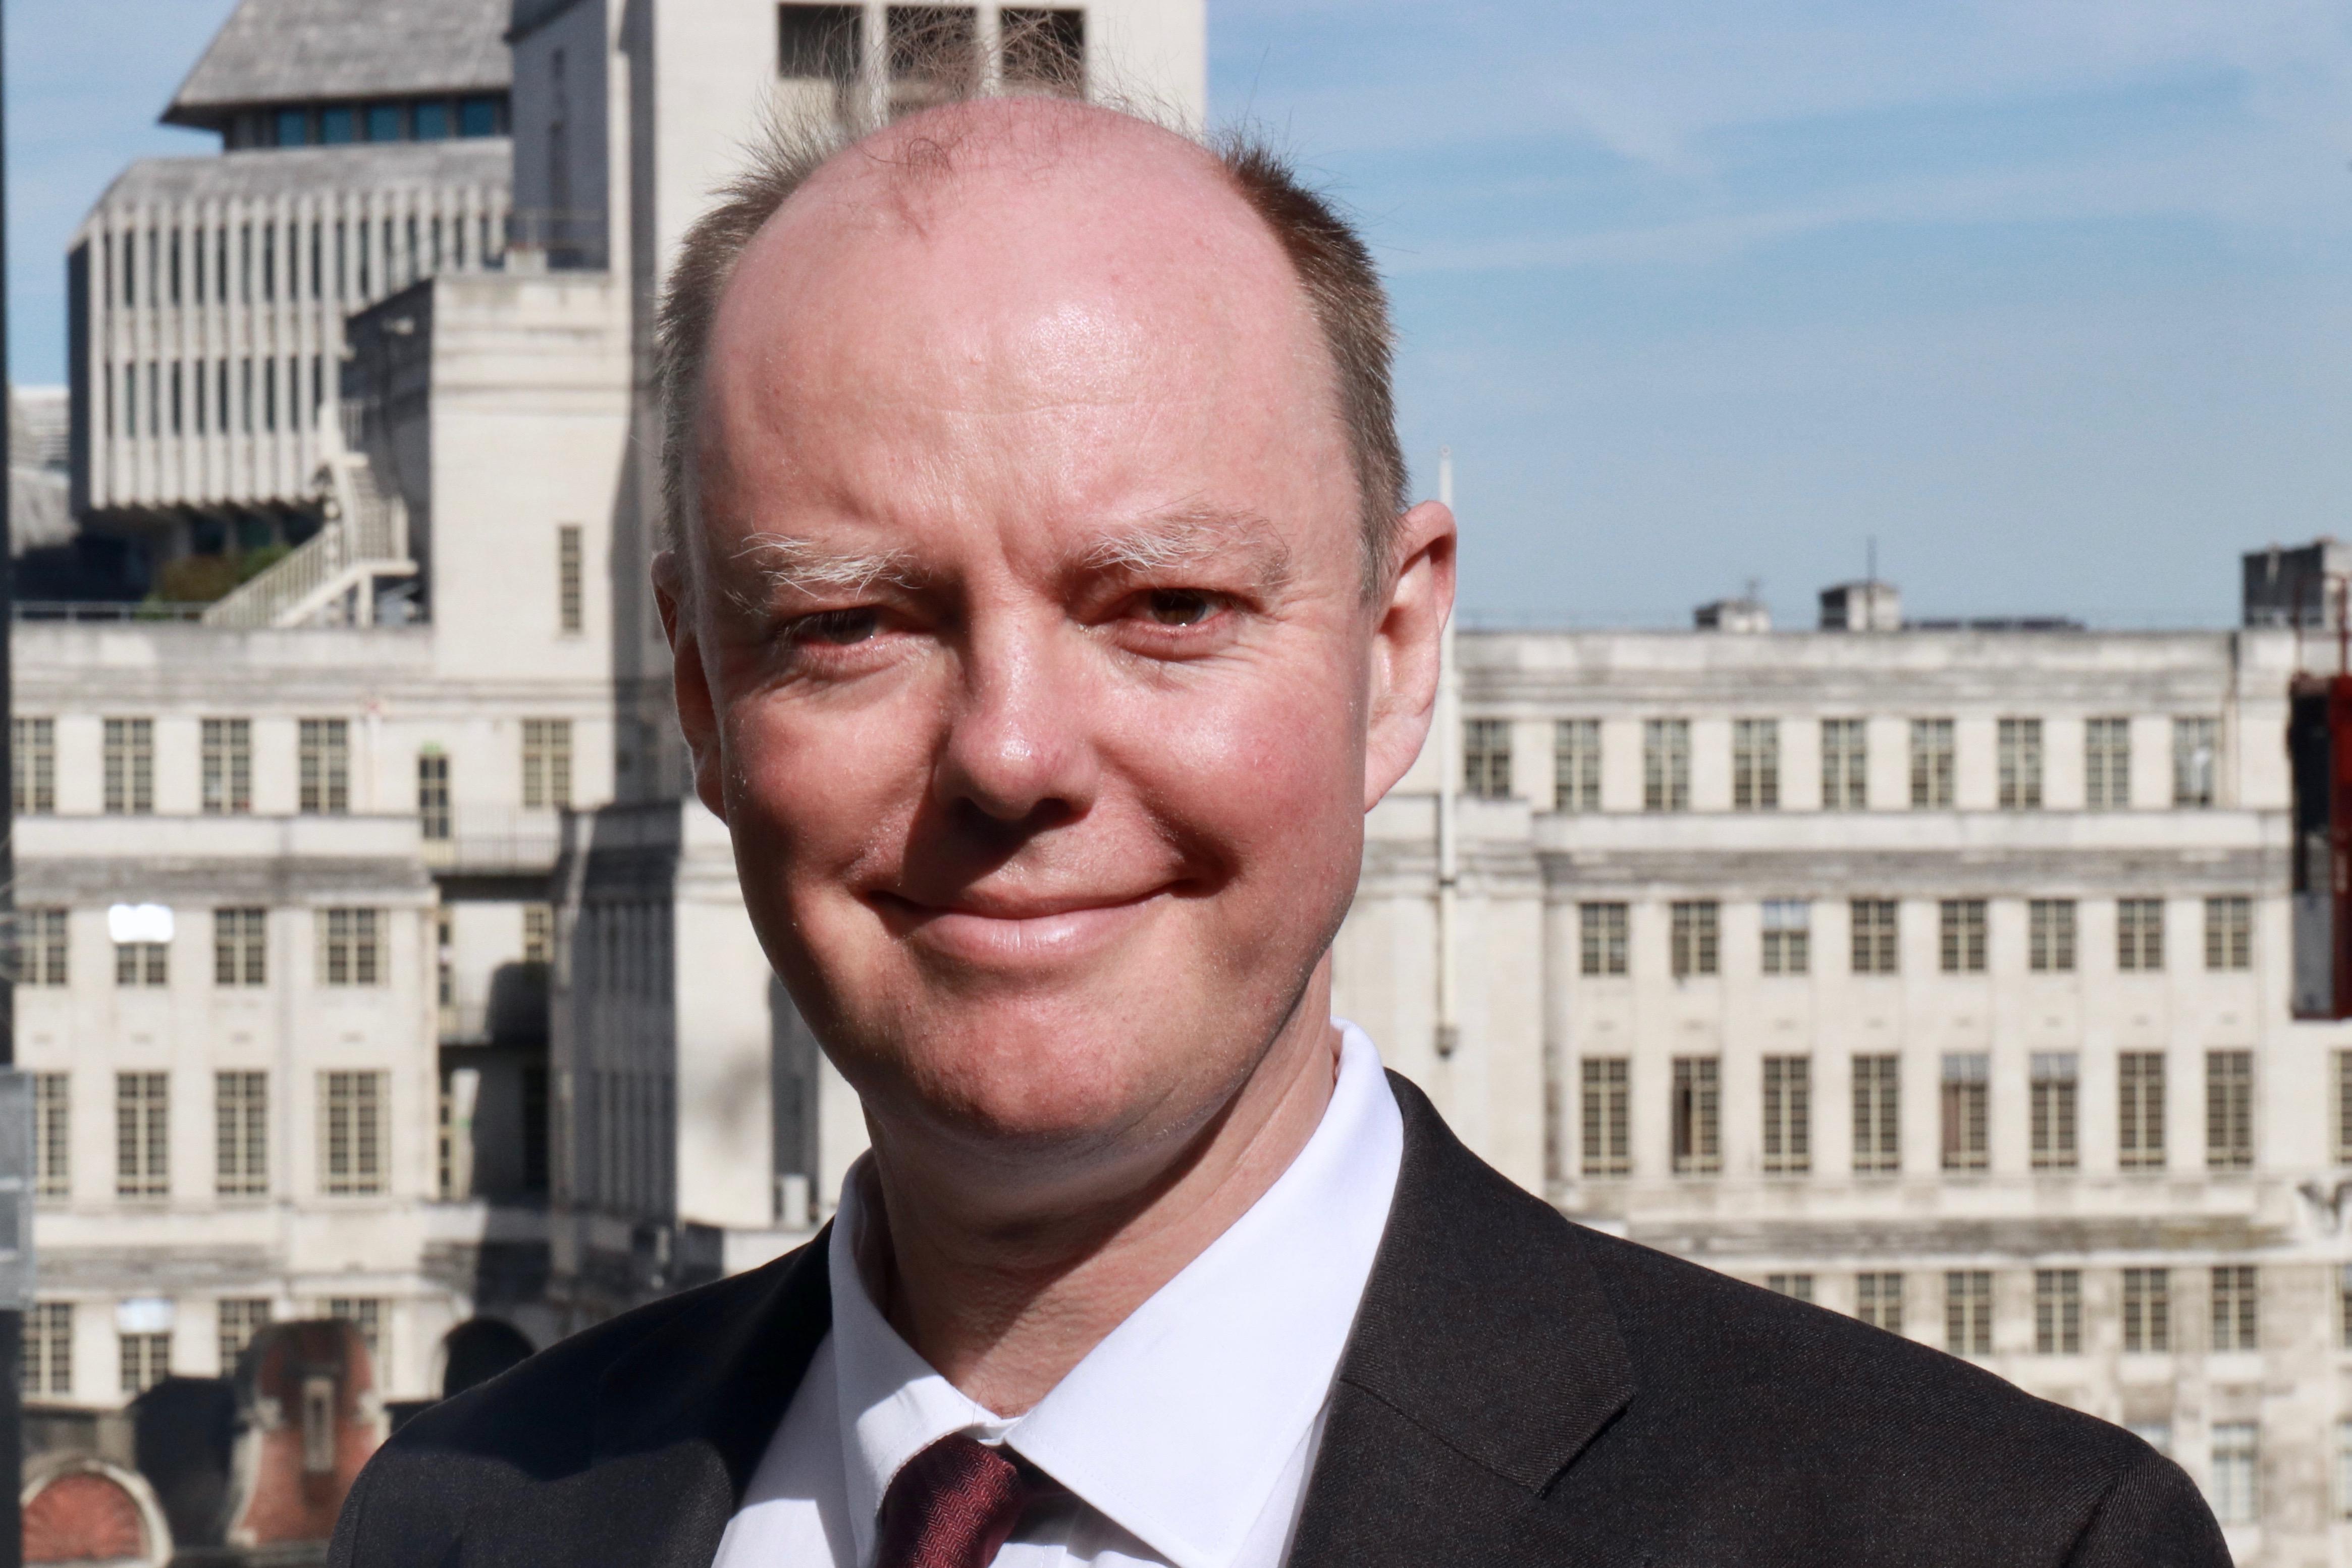 Professor Christopher Whitty